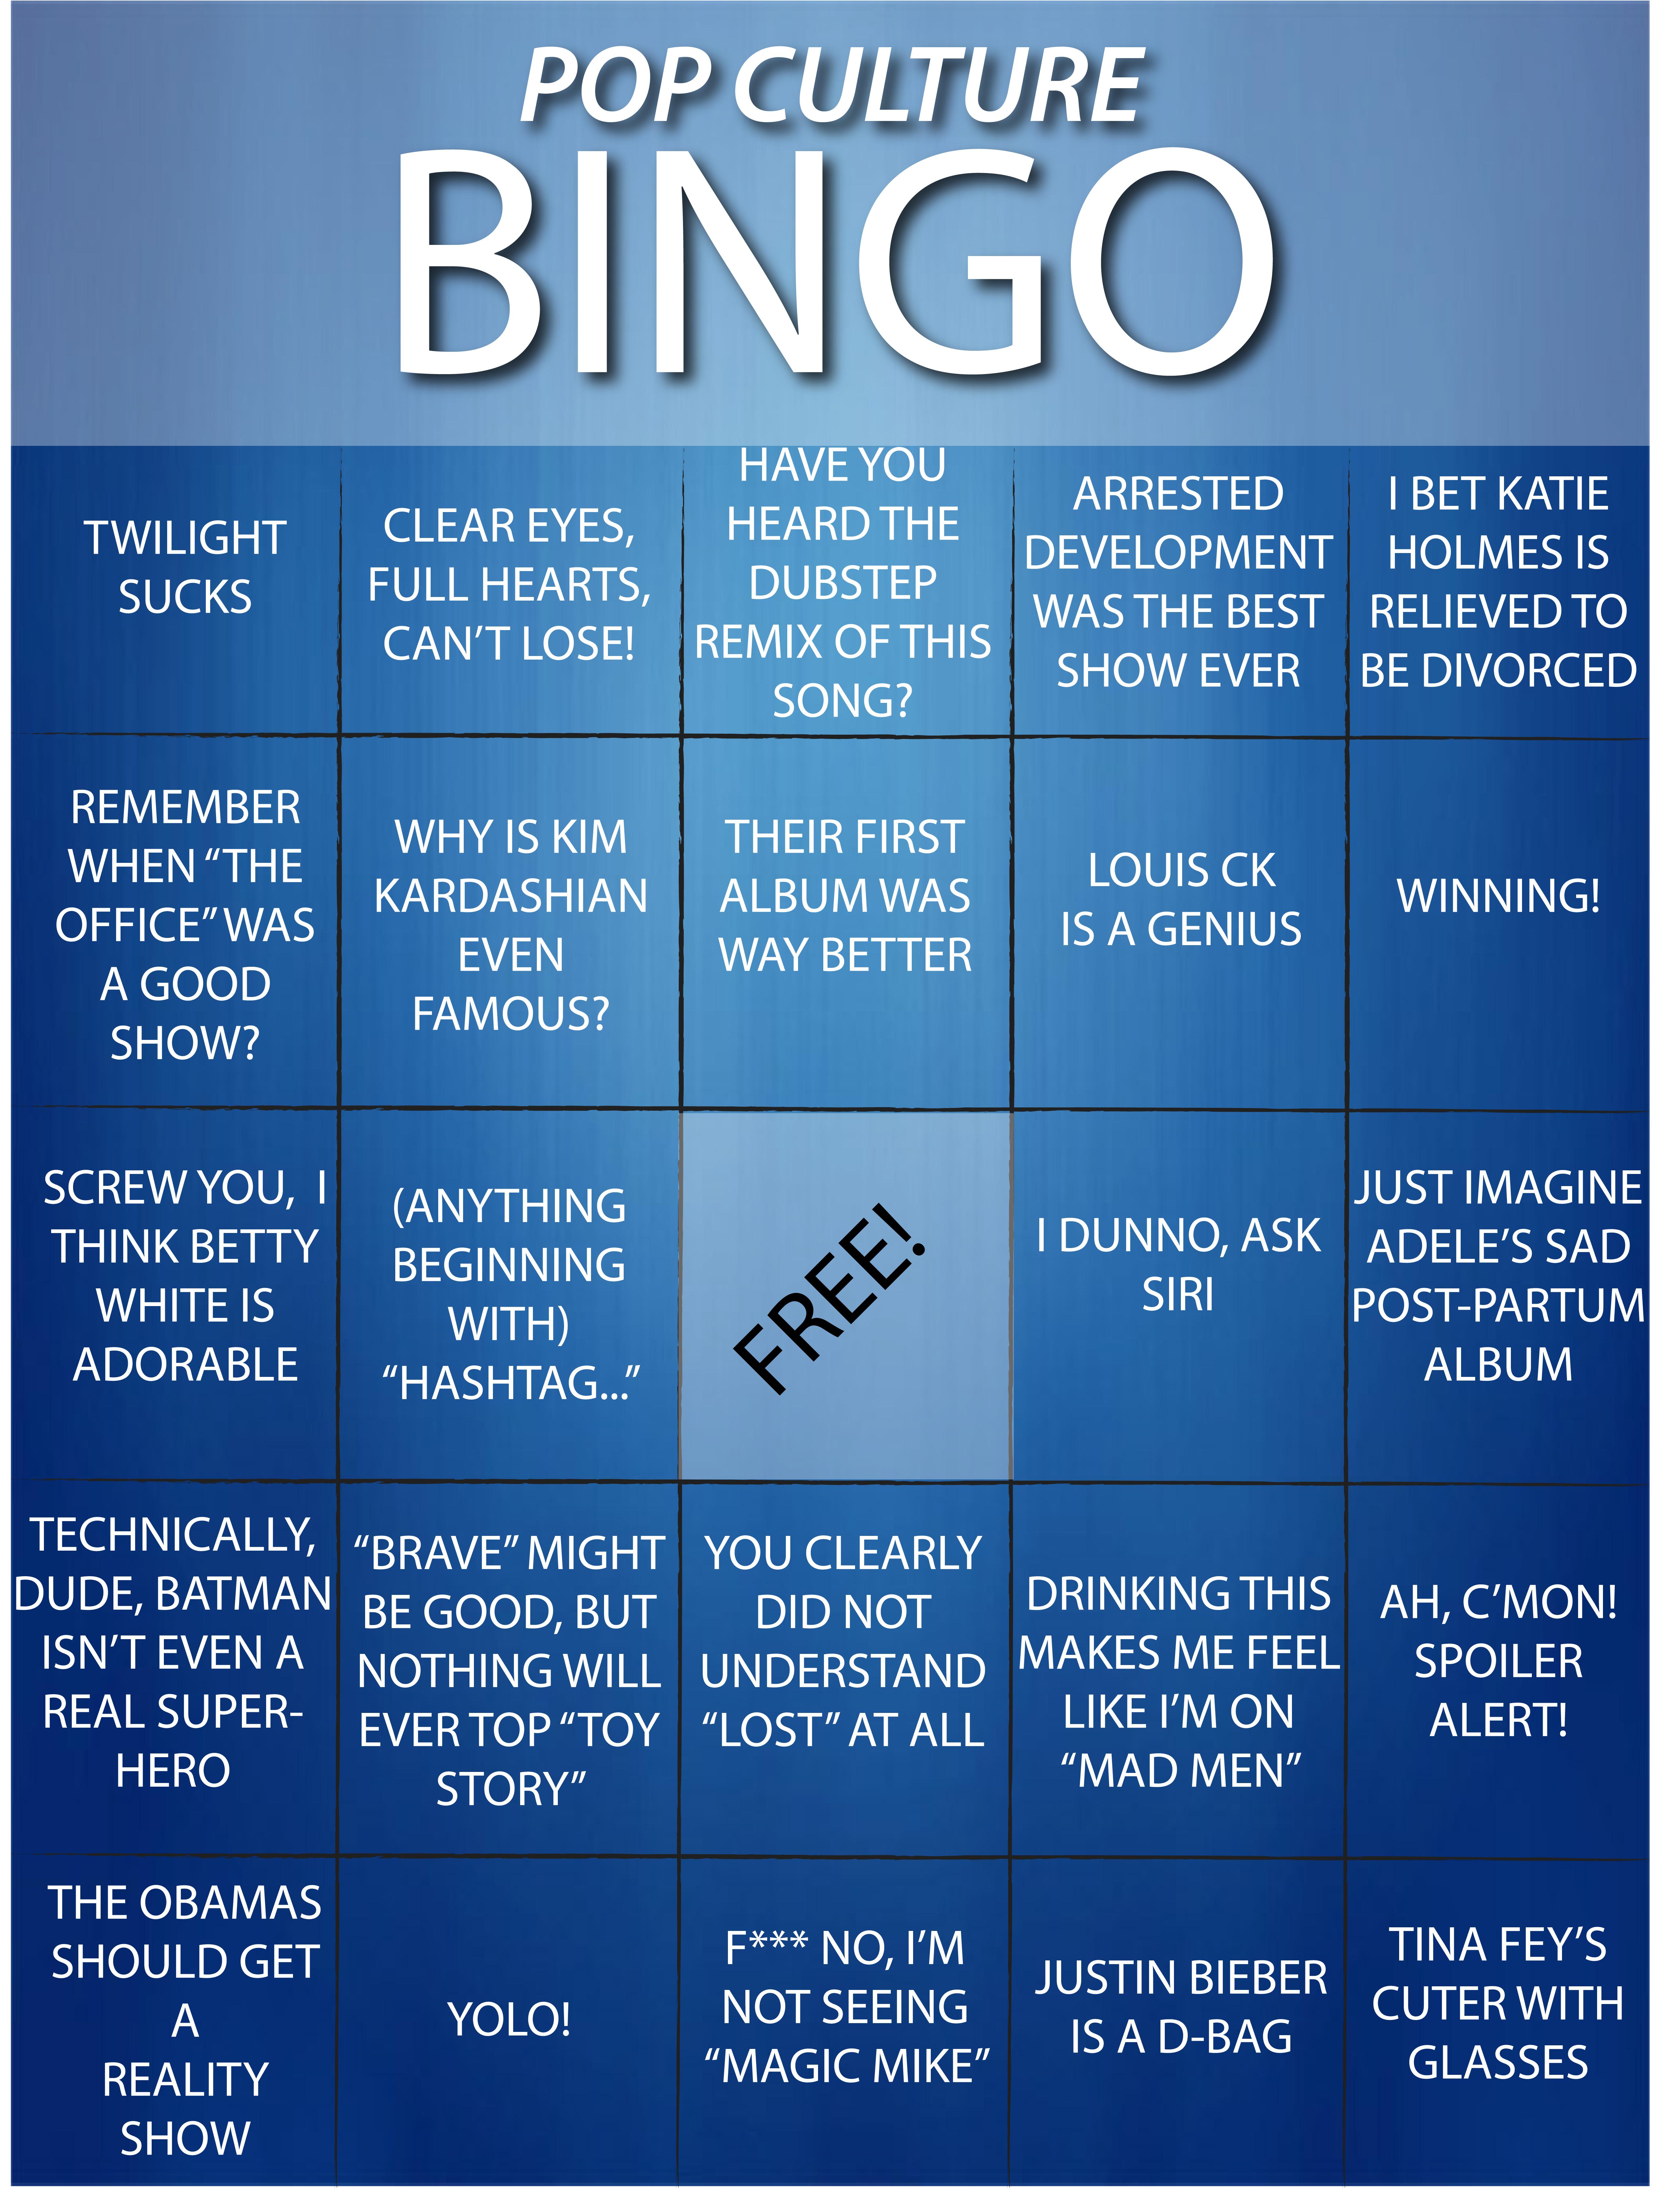 Pop Culture Bingo card